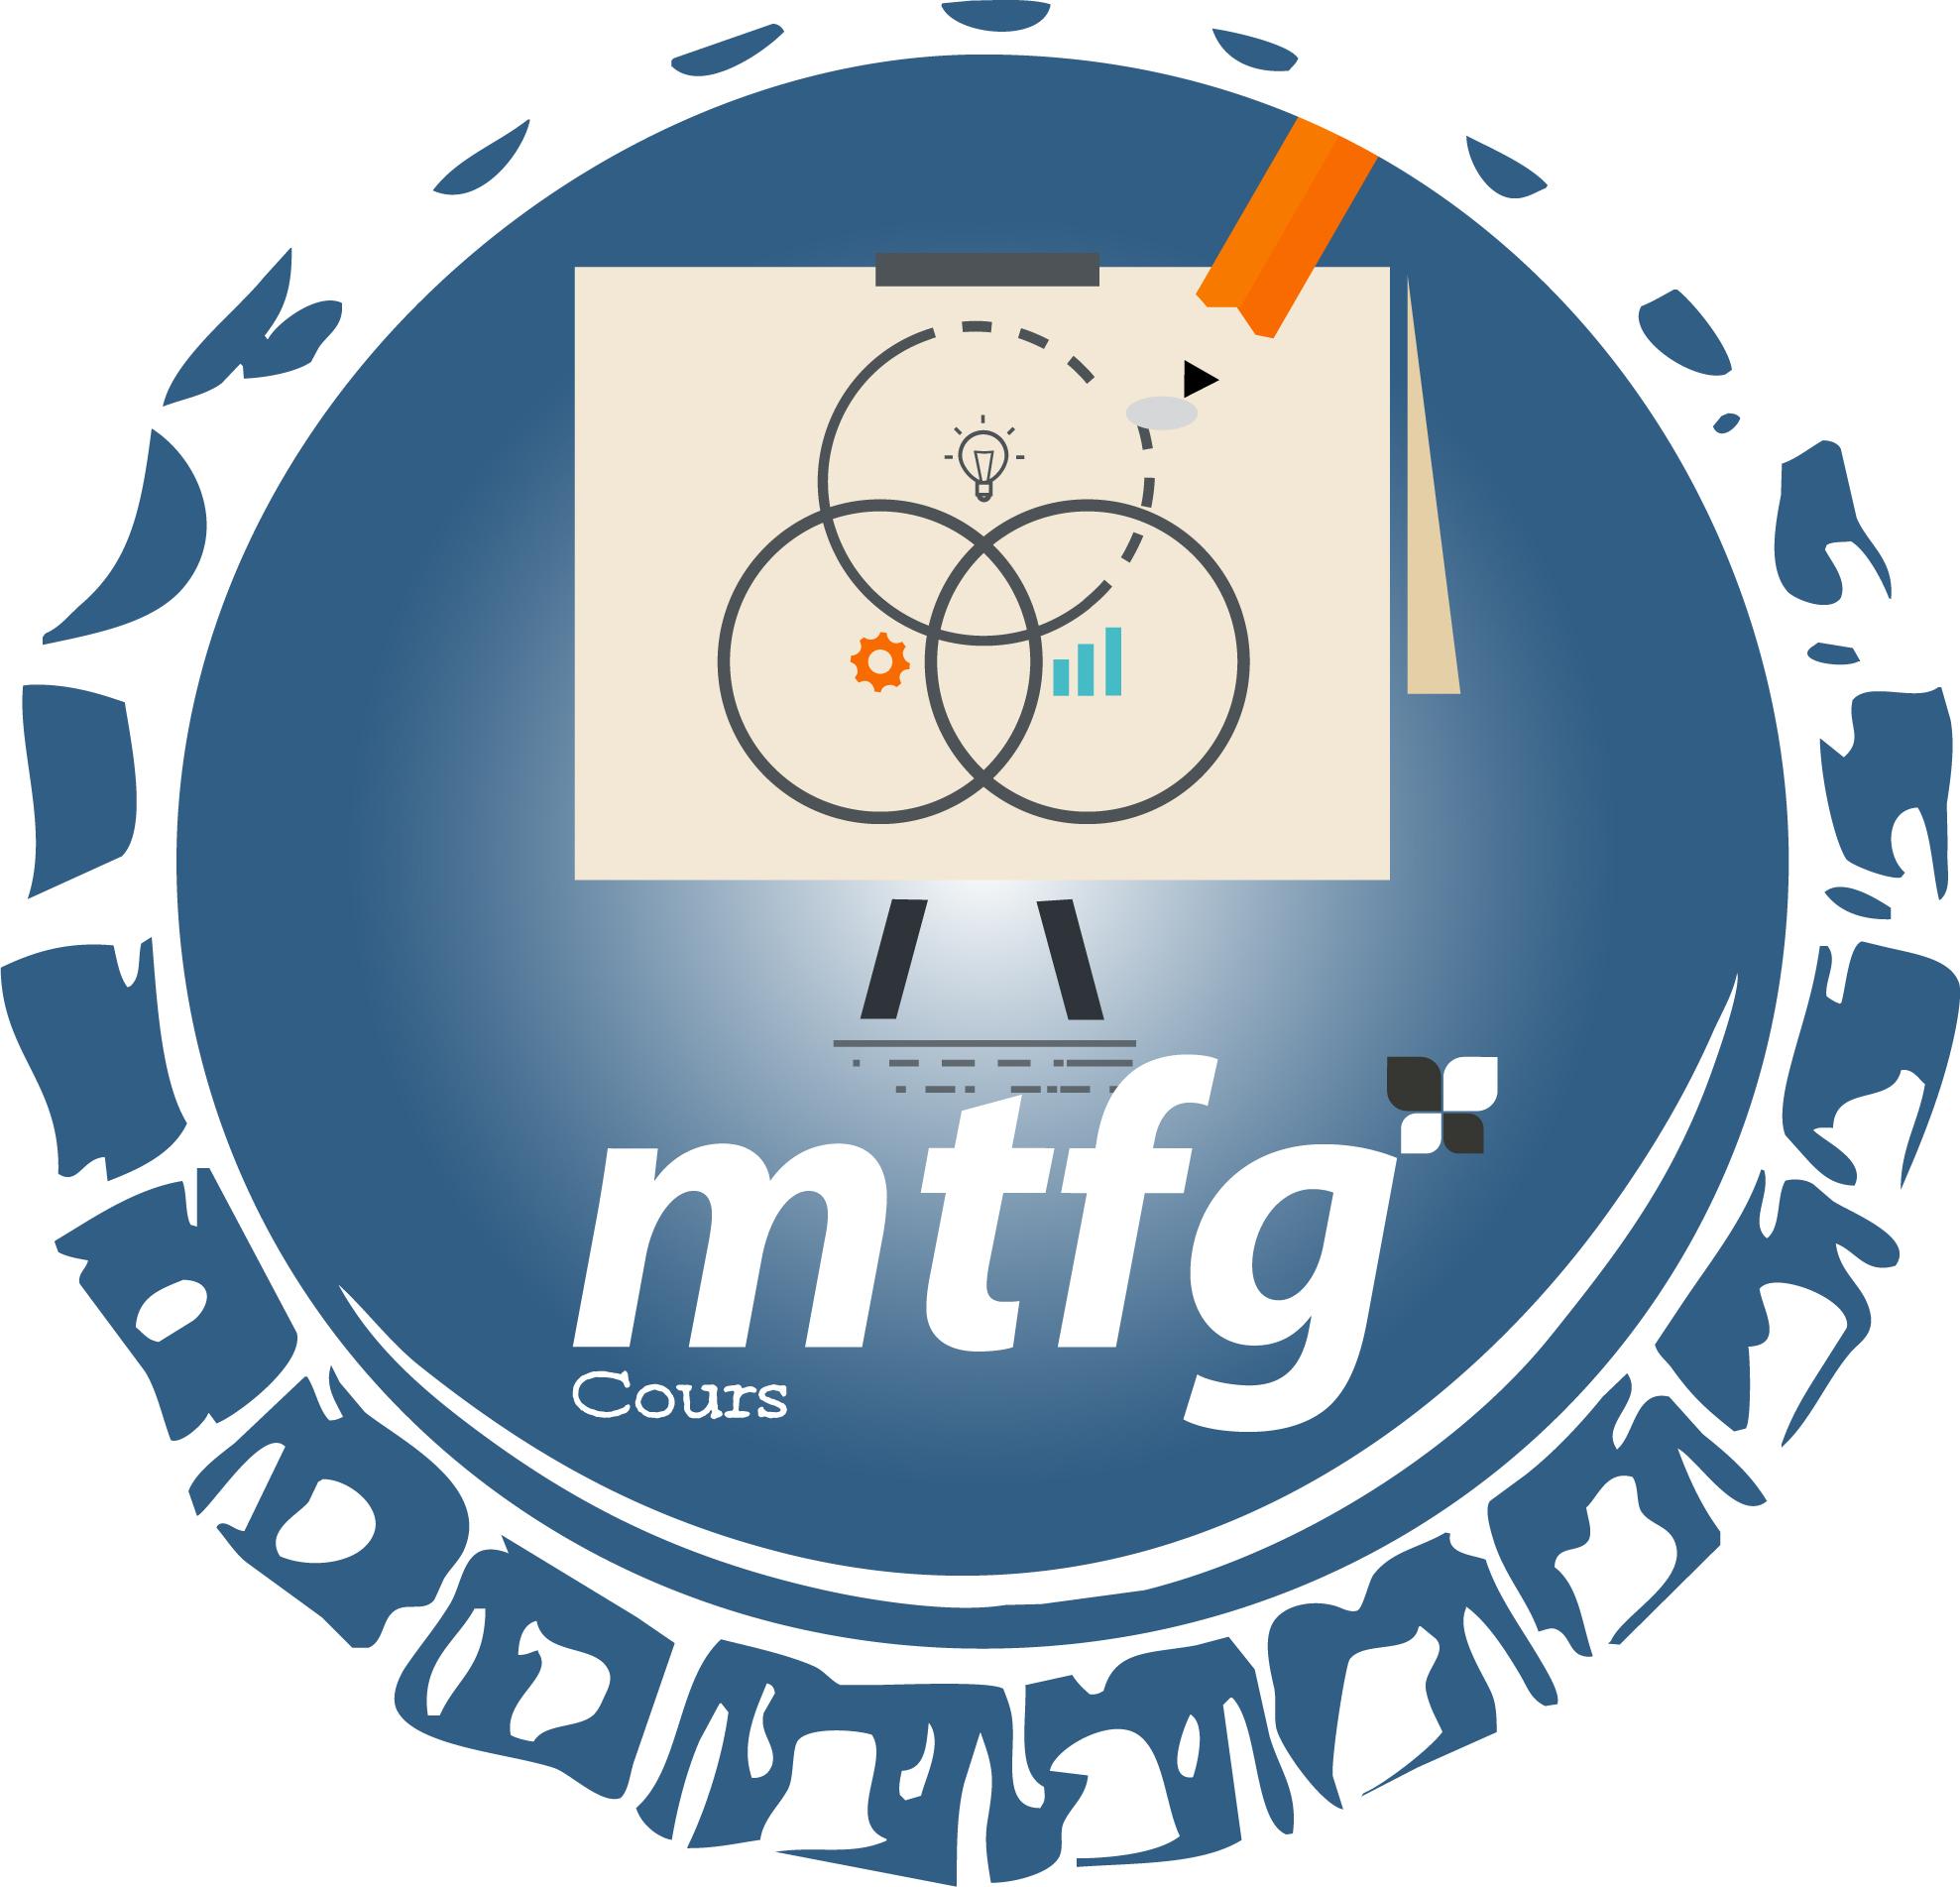 MTFG Cours